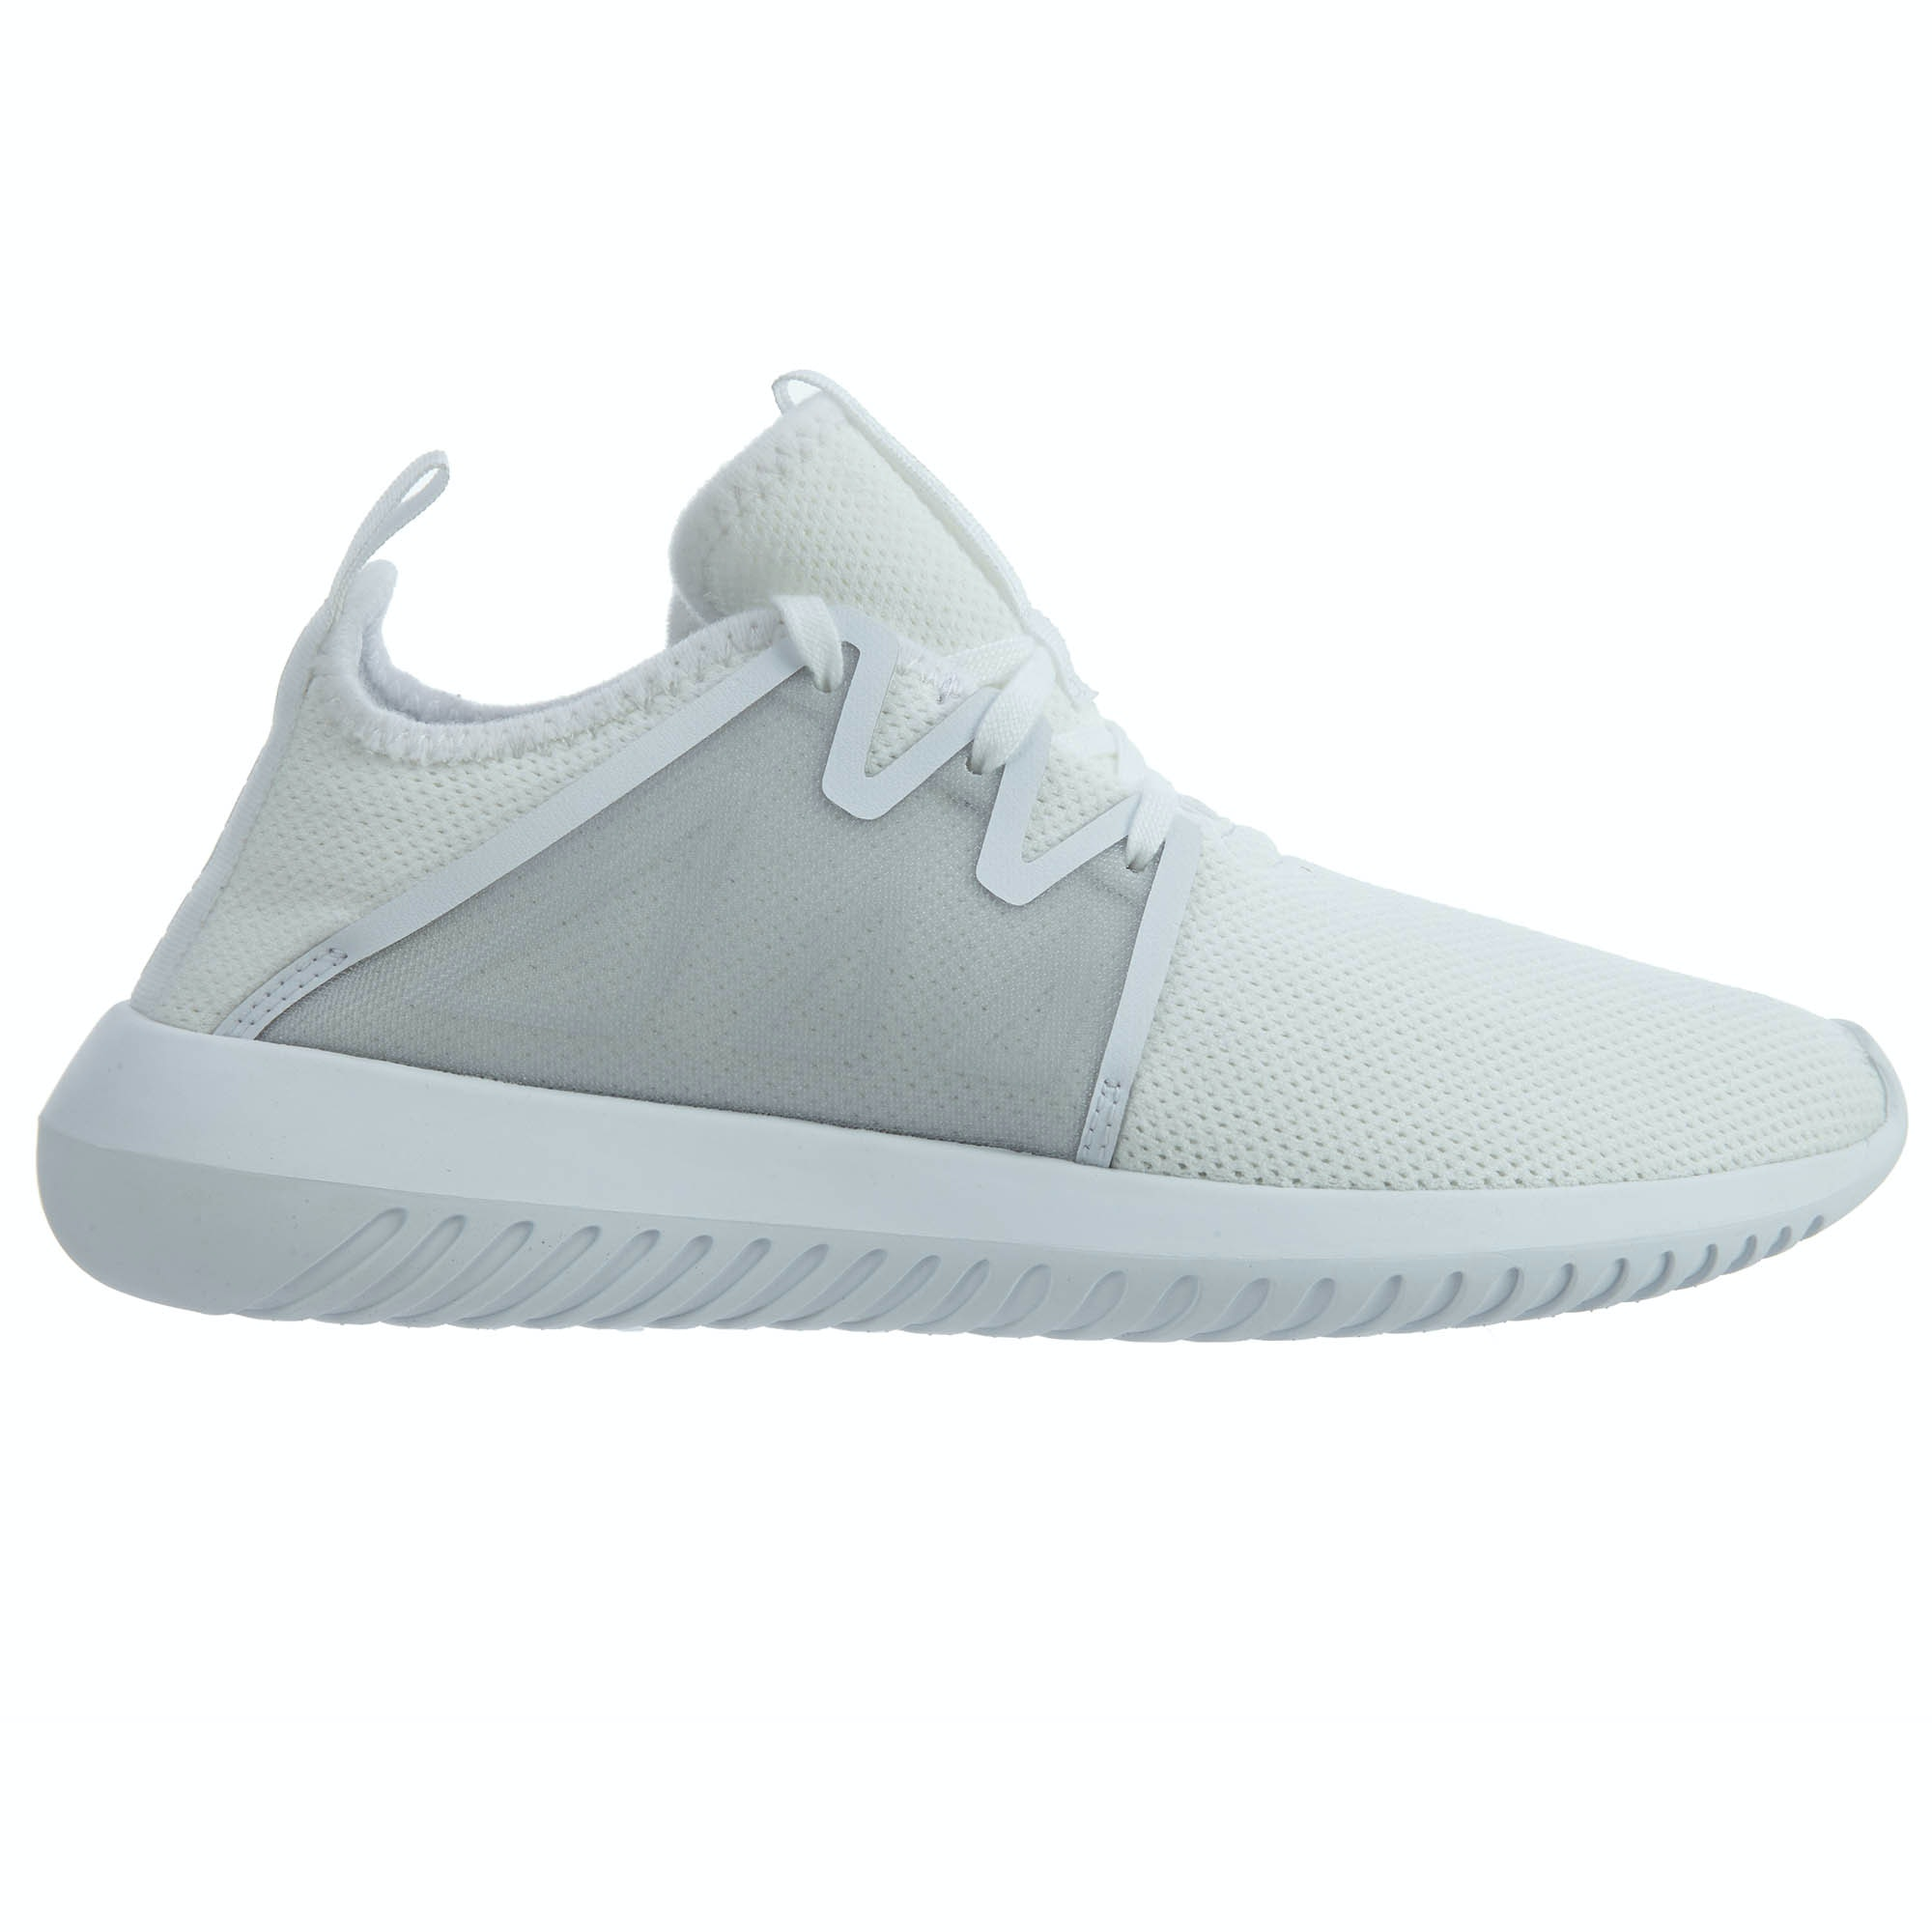 adidas Tubular Viral2 White Grey-White (W)